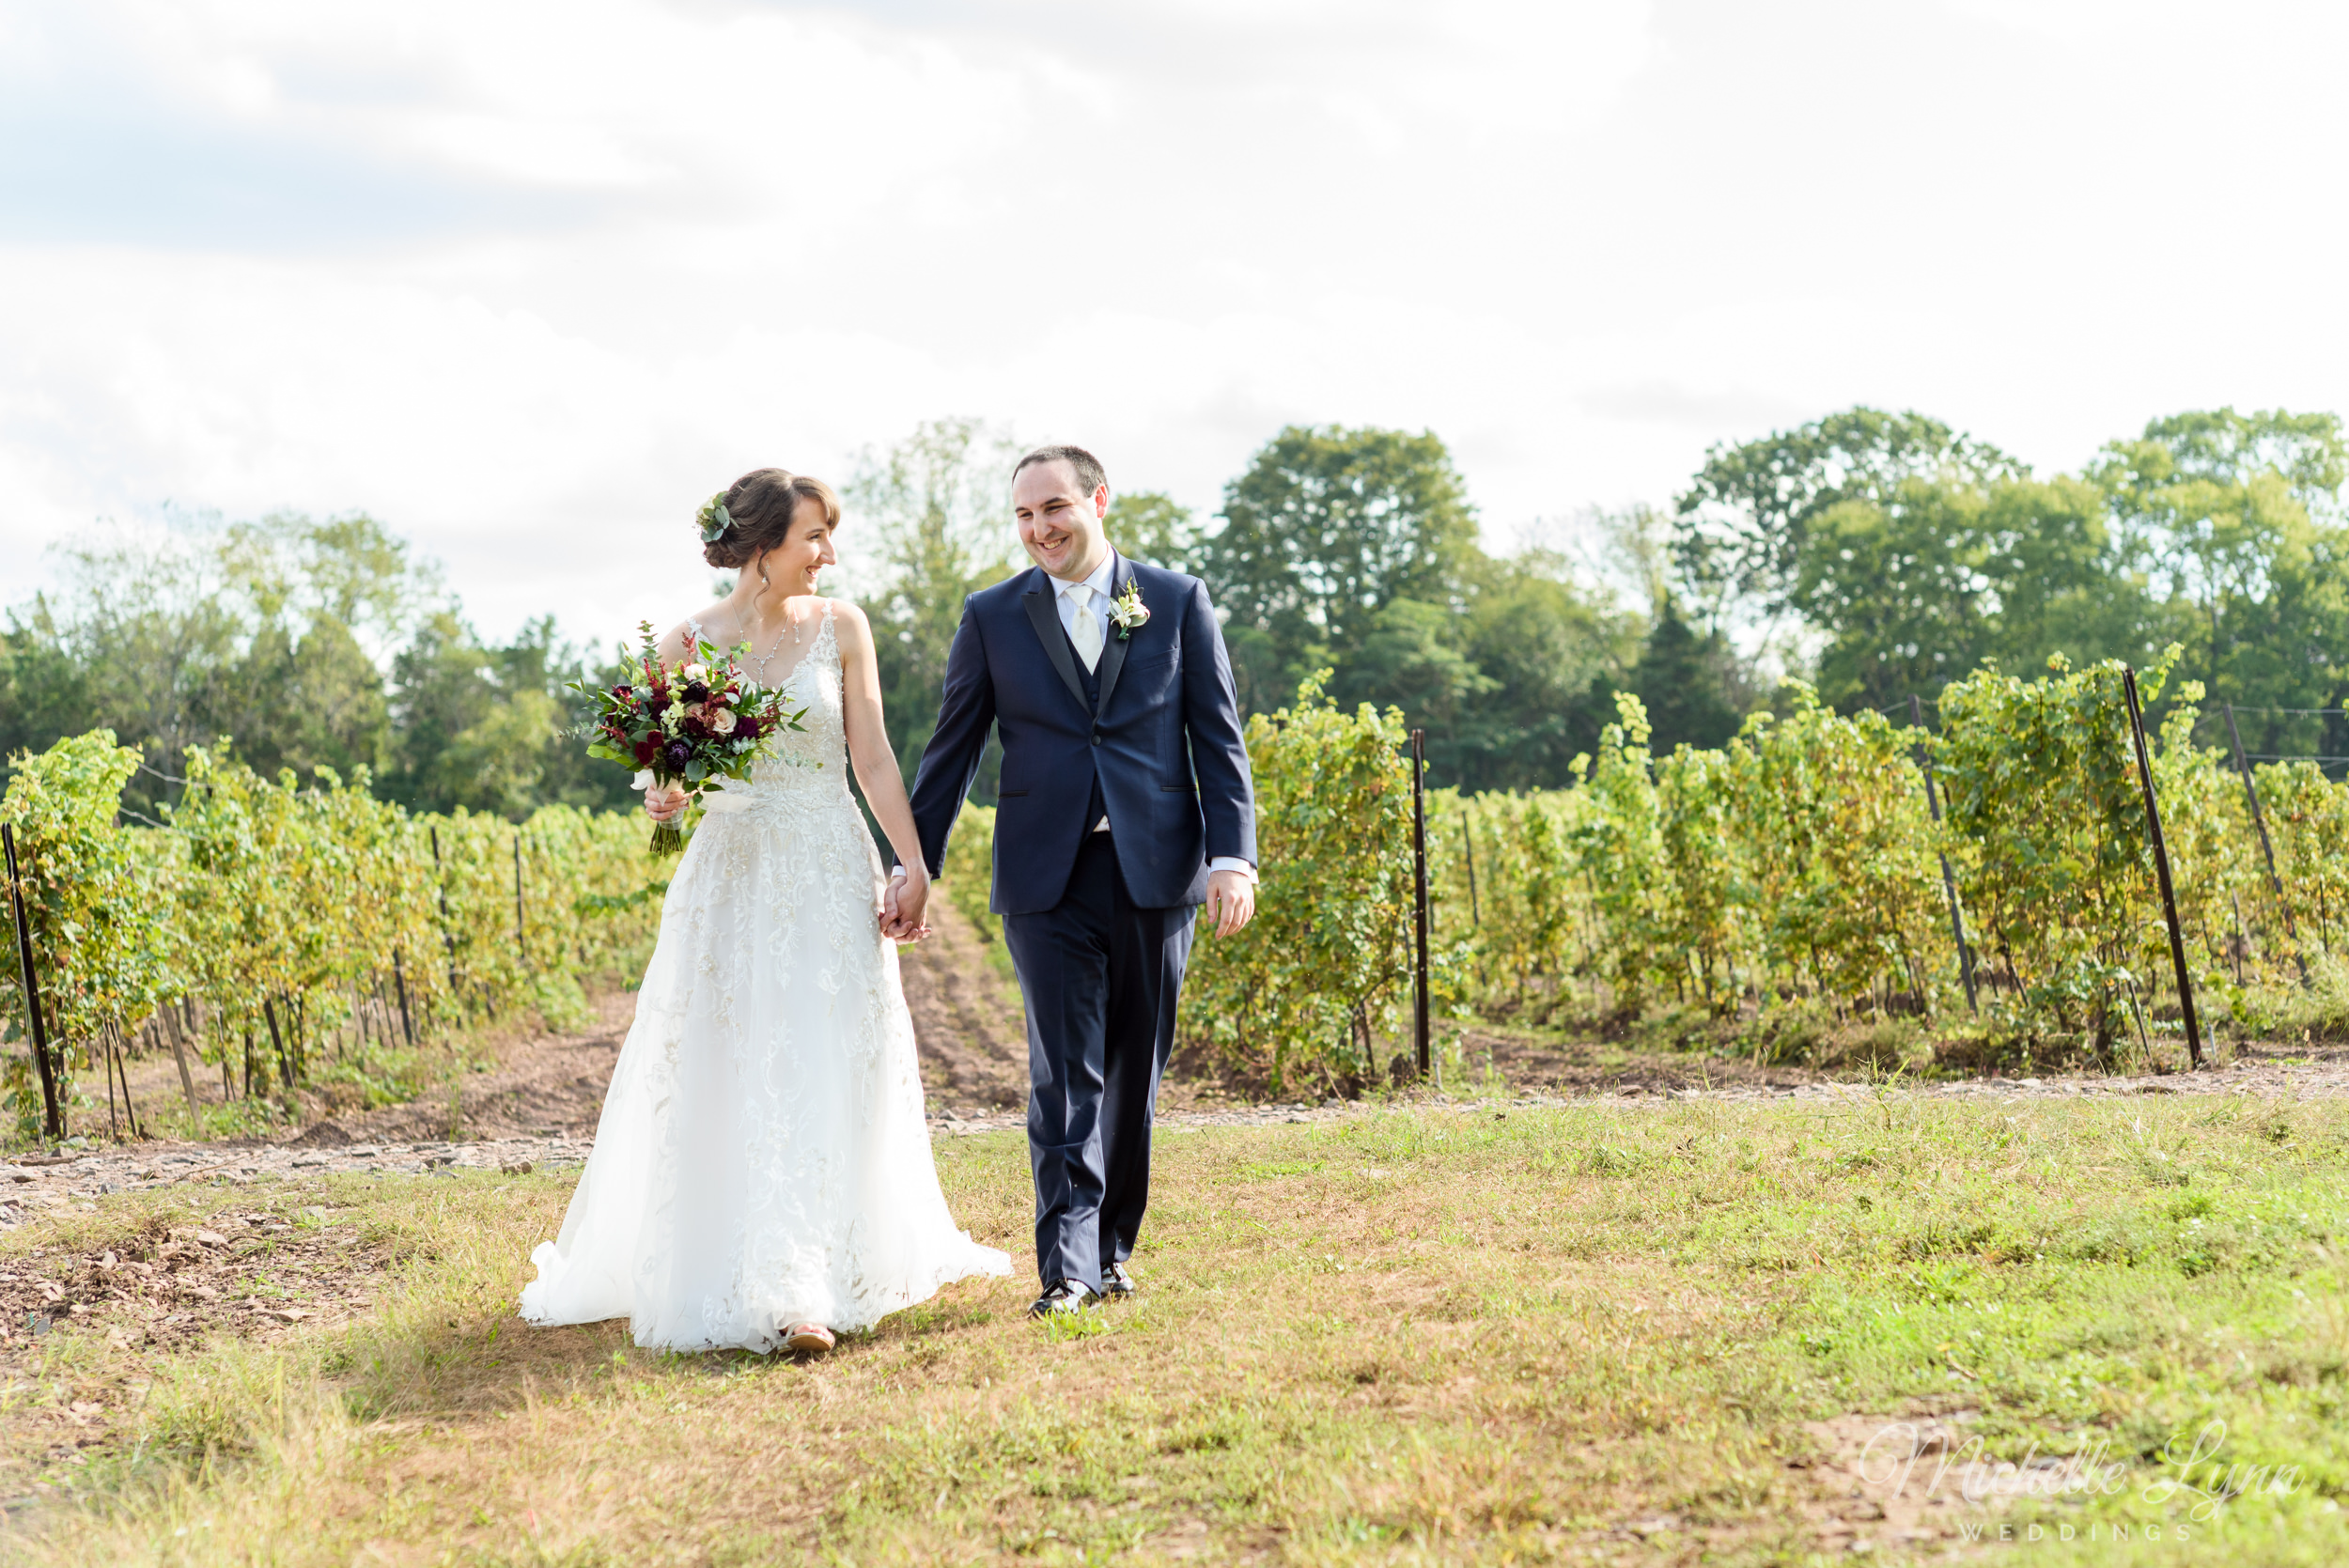 sand-castle-winery-pennsylvania-wedding-photography-46.jpg